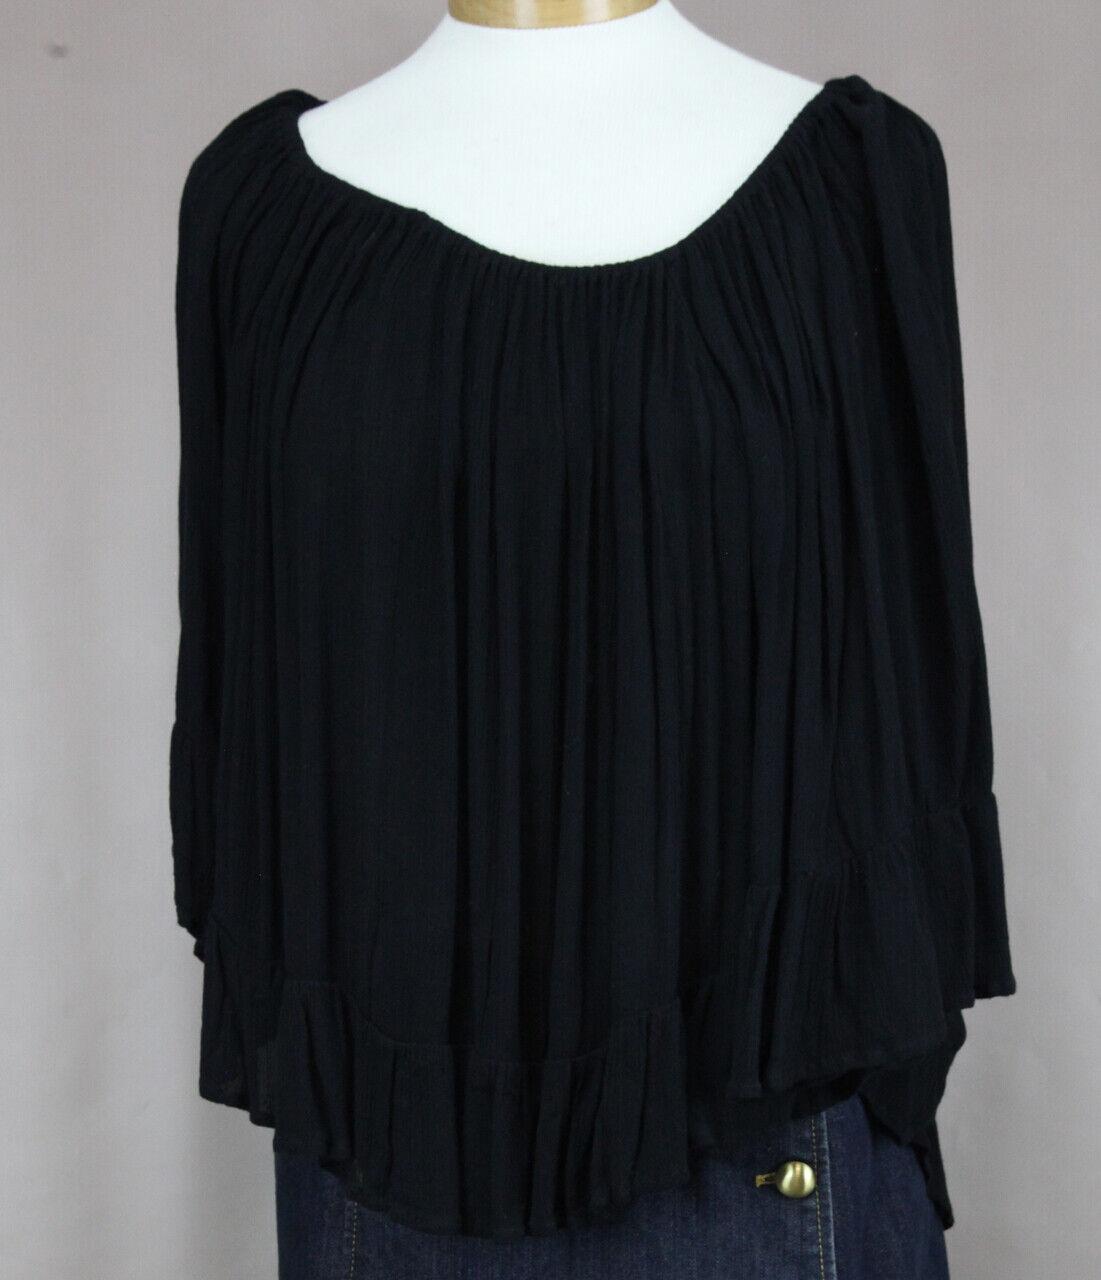 Ralph Lauren Jeans & Supply Donna Nero Increspatura Camicetta Ret Nuovo